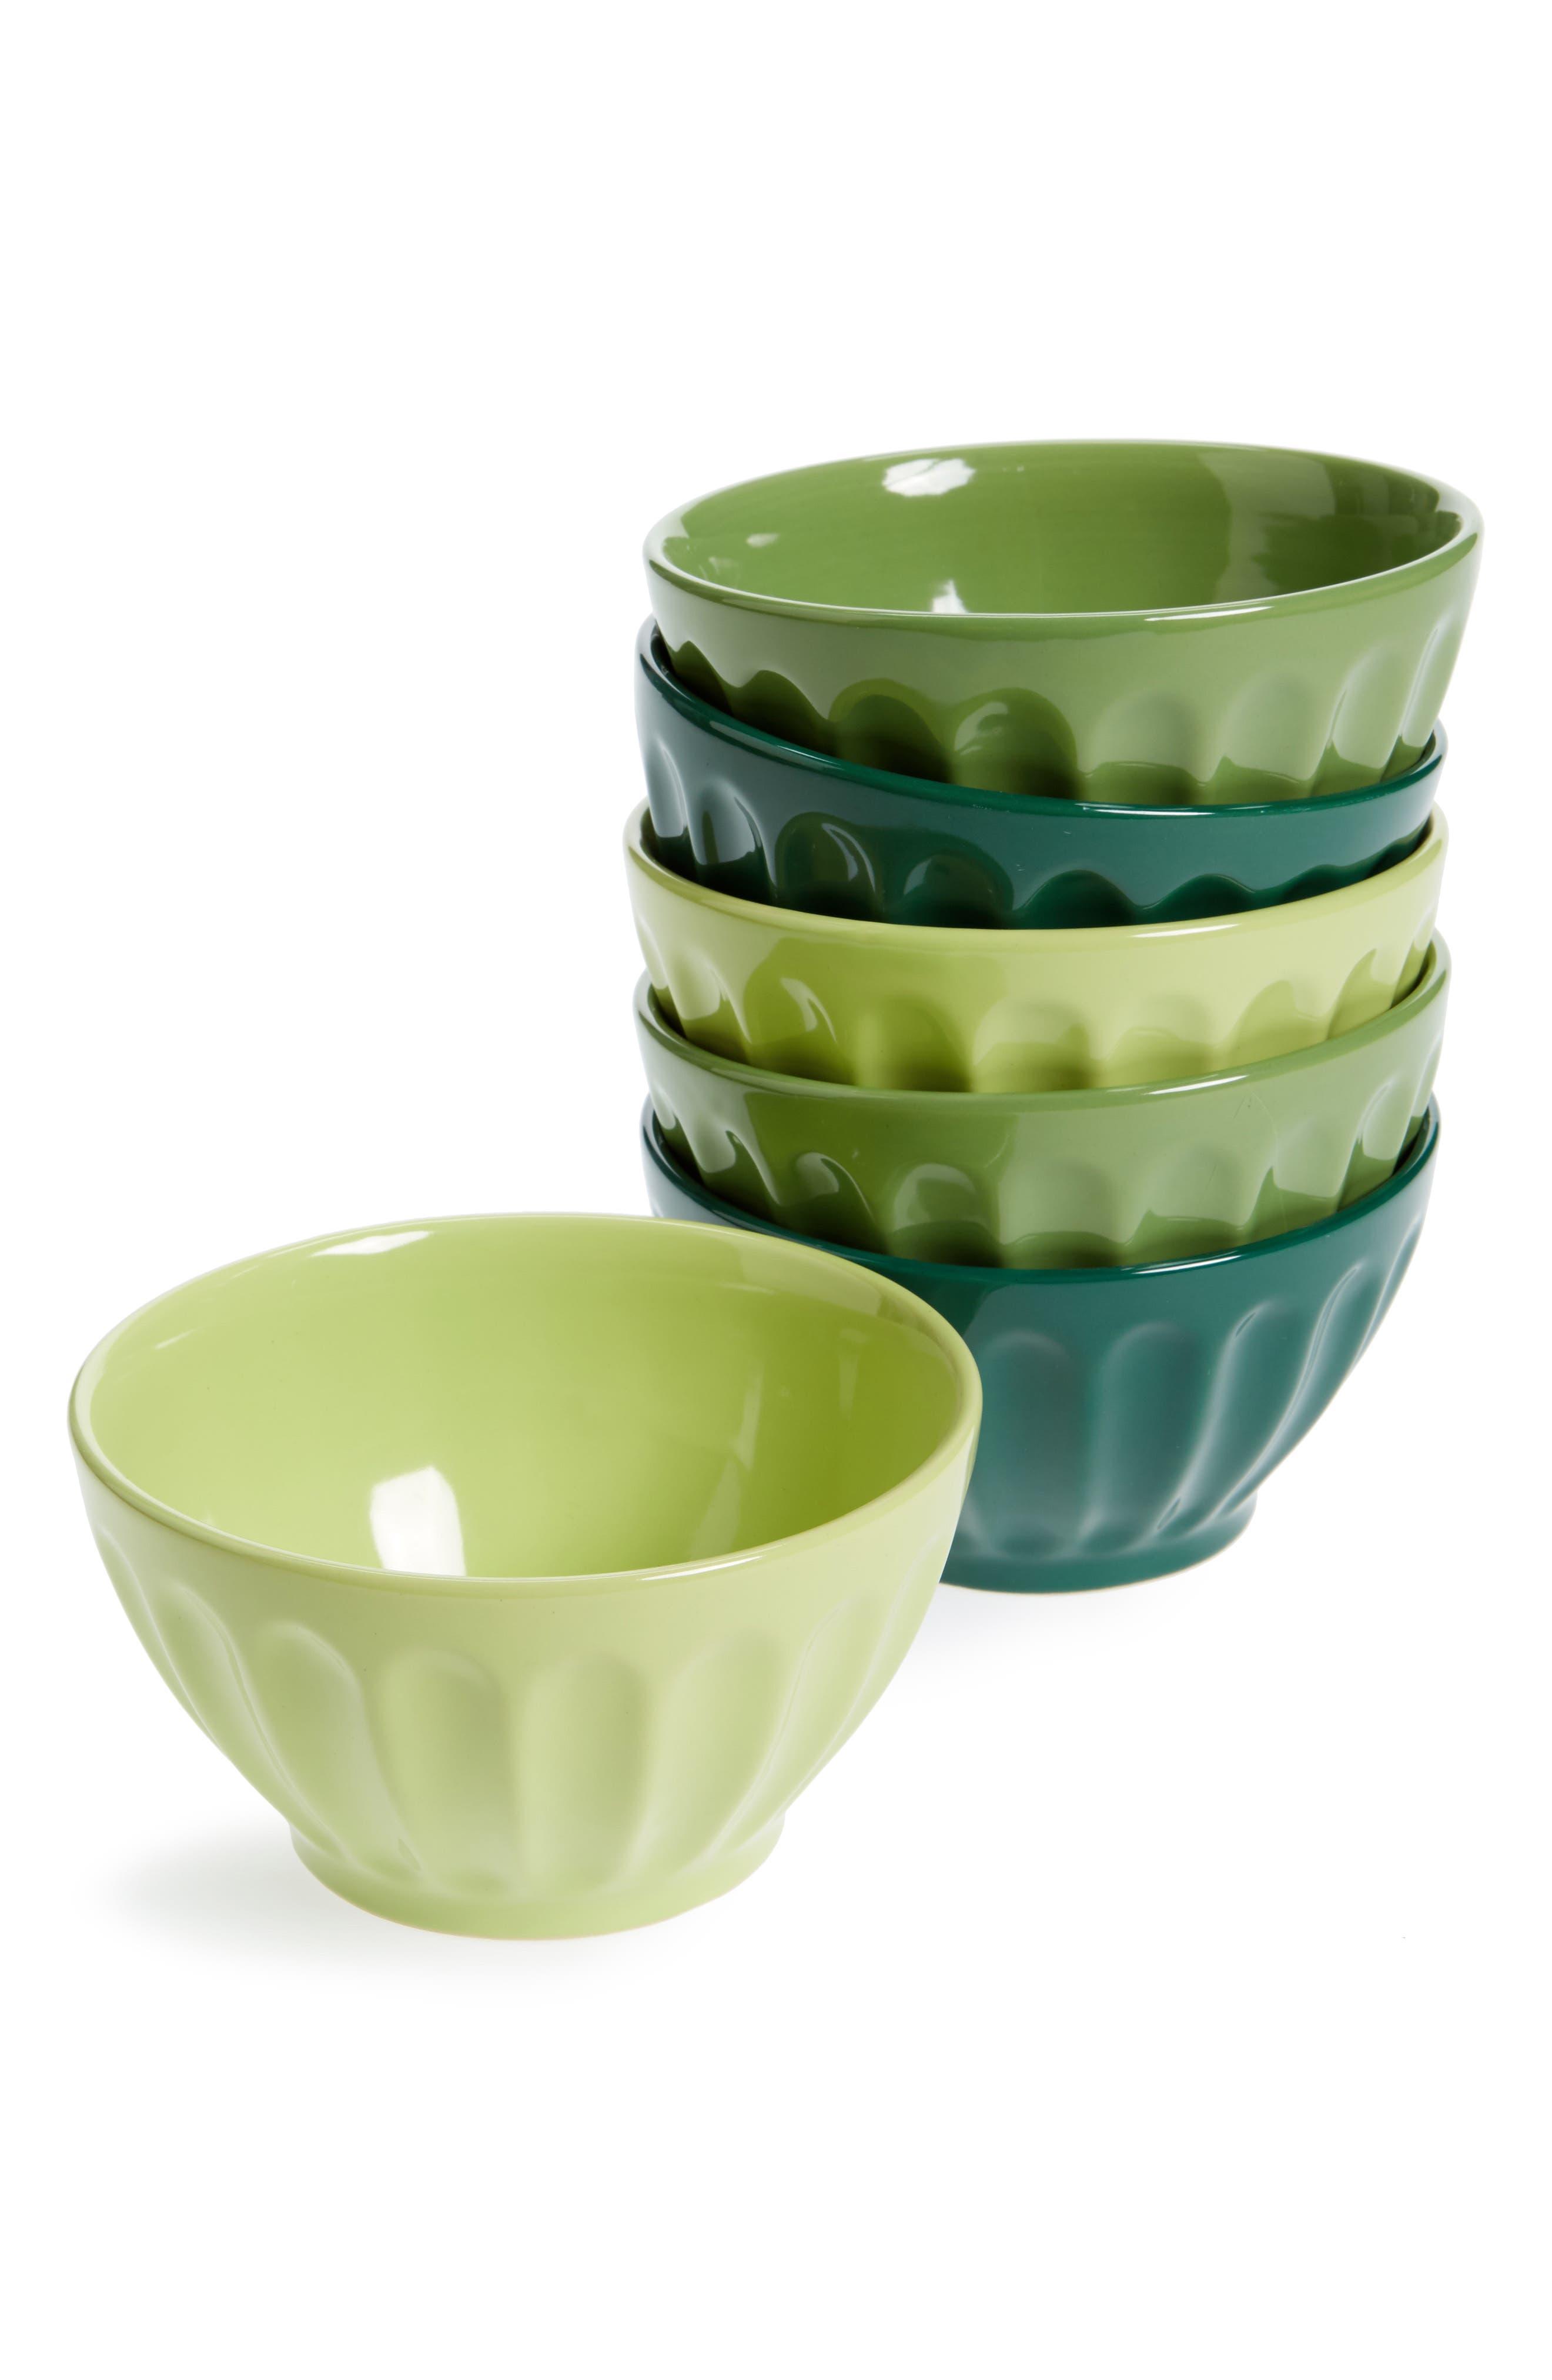 Main Image - American Atelier Set of 6 Latte Bowls